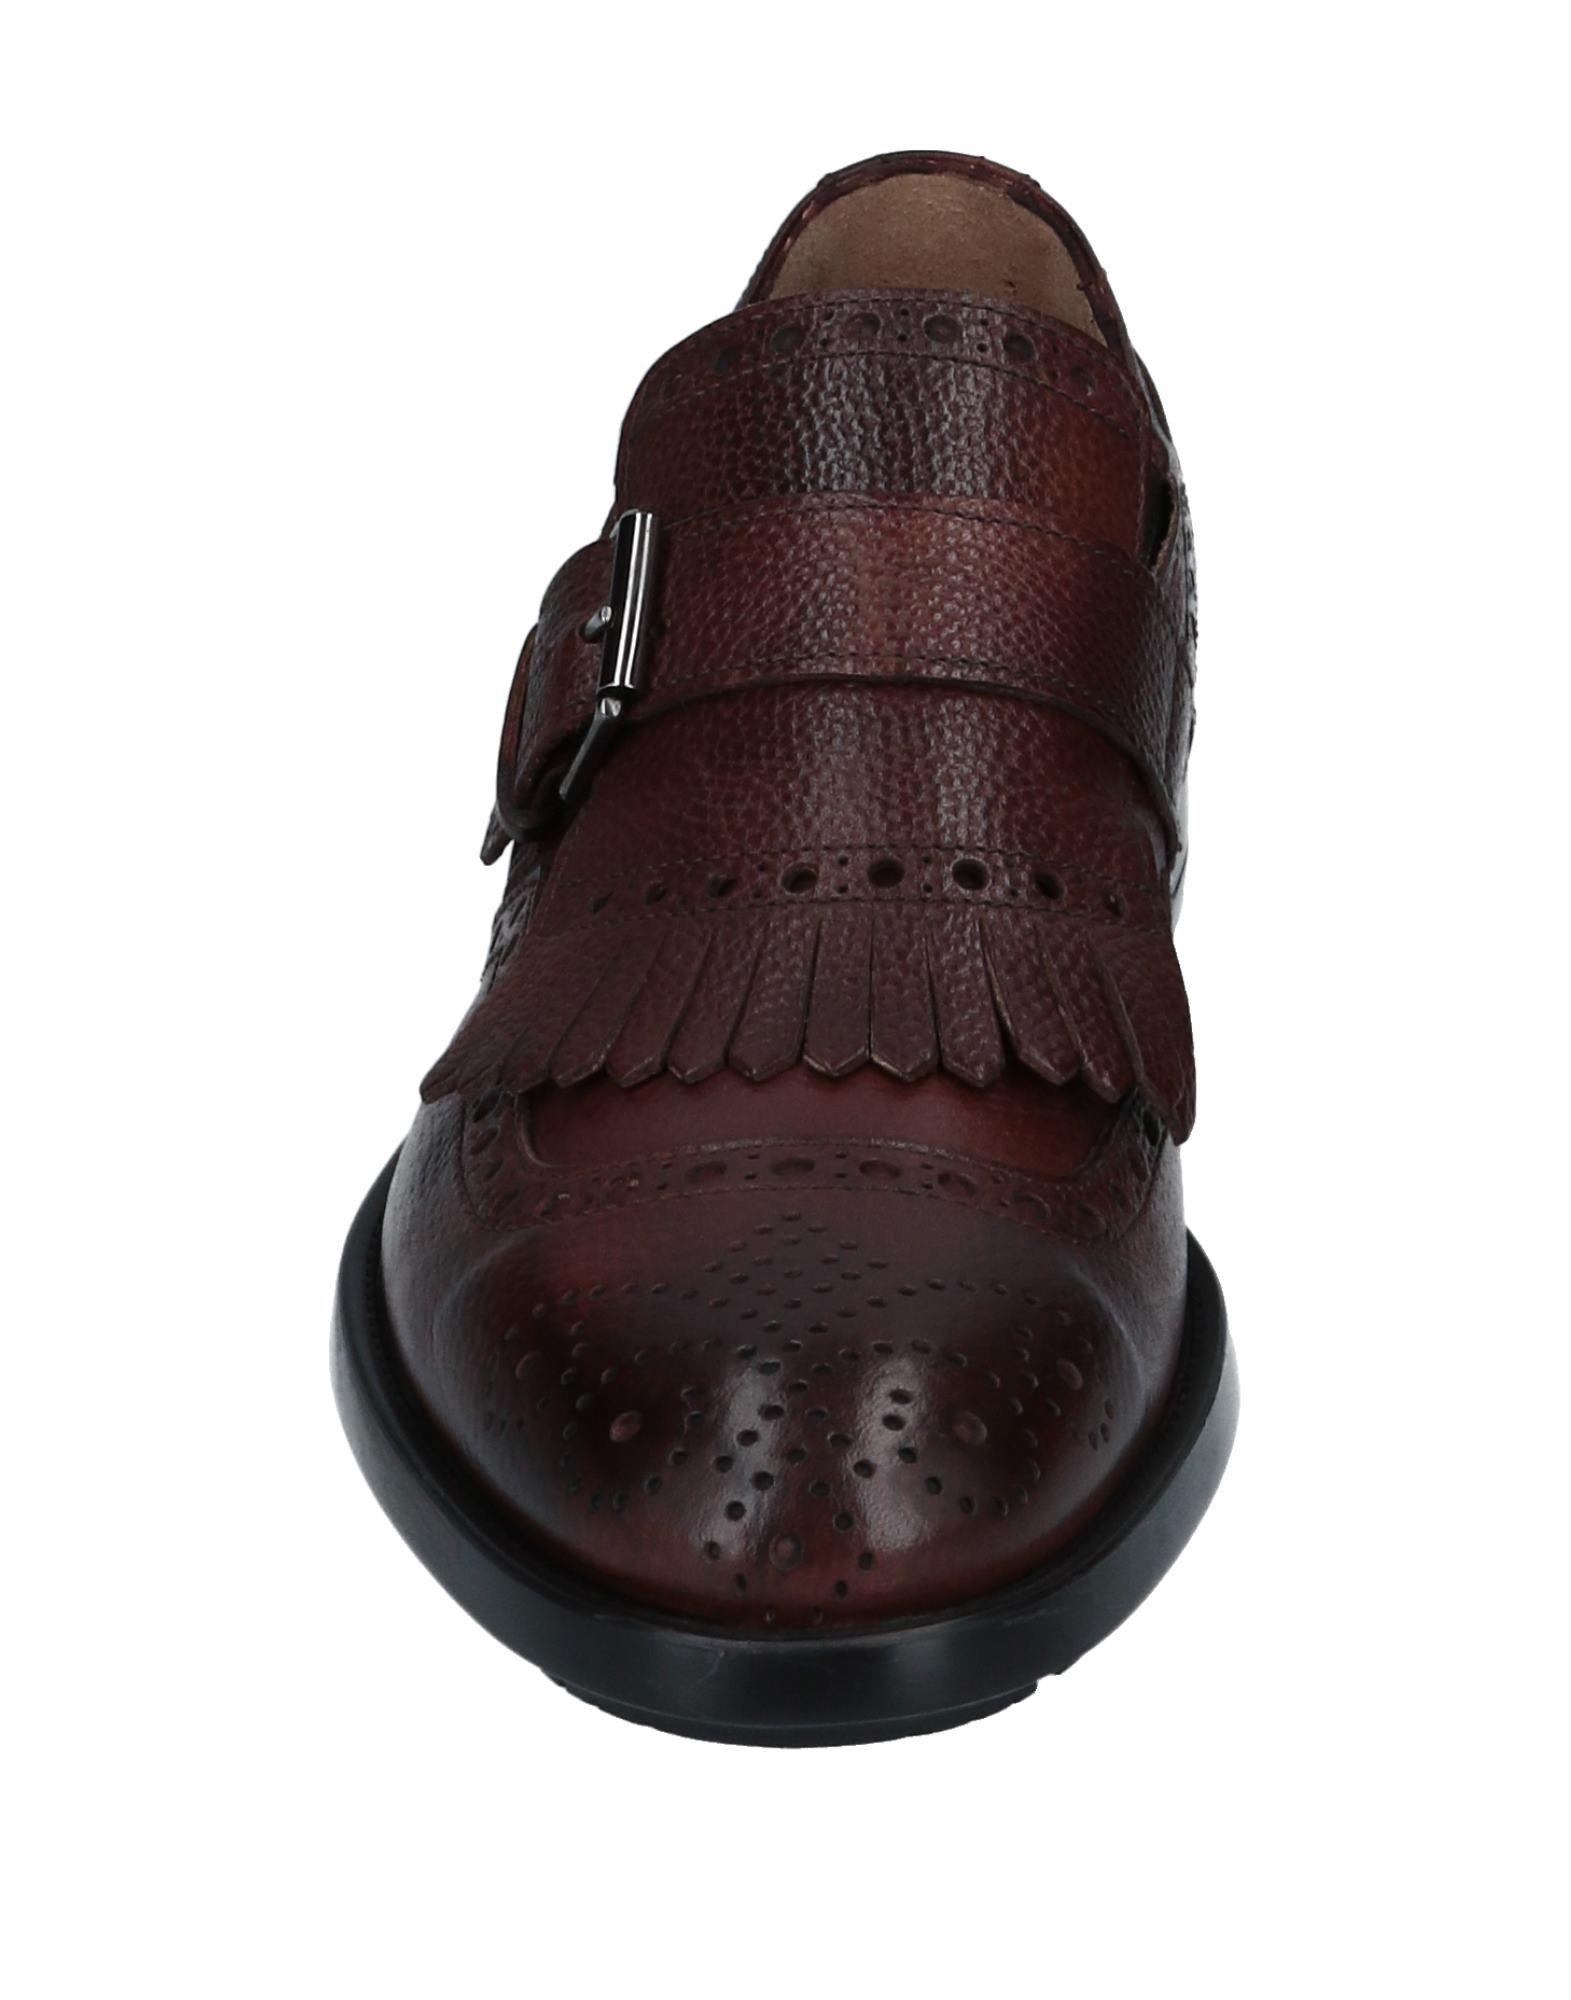 Baldinini Mokassins Herren  11554462LU Gute Gute 11554462LU Qualität beliebte Schuhe 340772